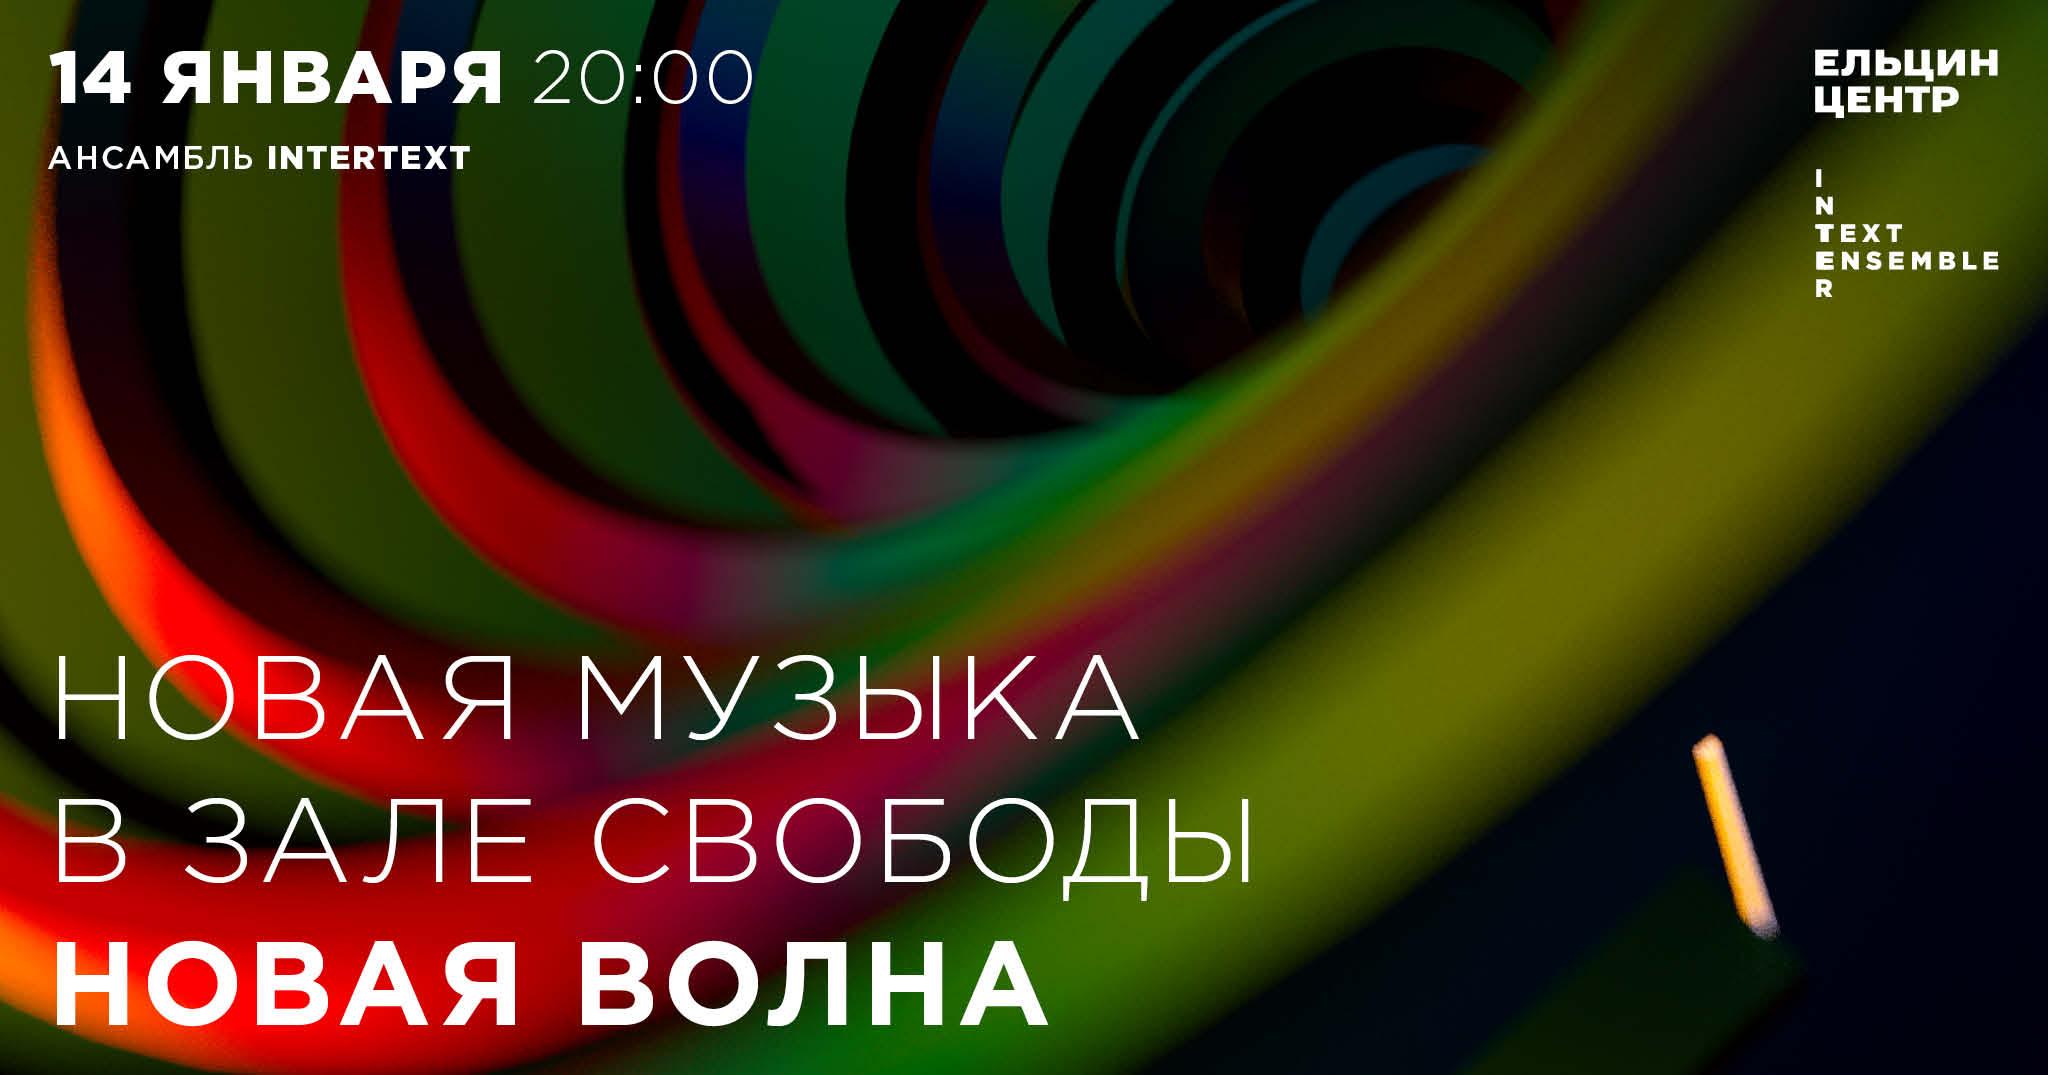 ПЕТР ТЕРМЕН И АНСАМБЛЬ INTERTEXT